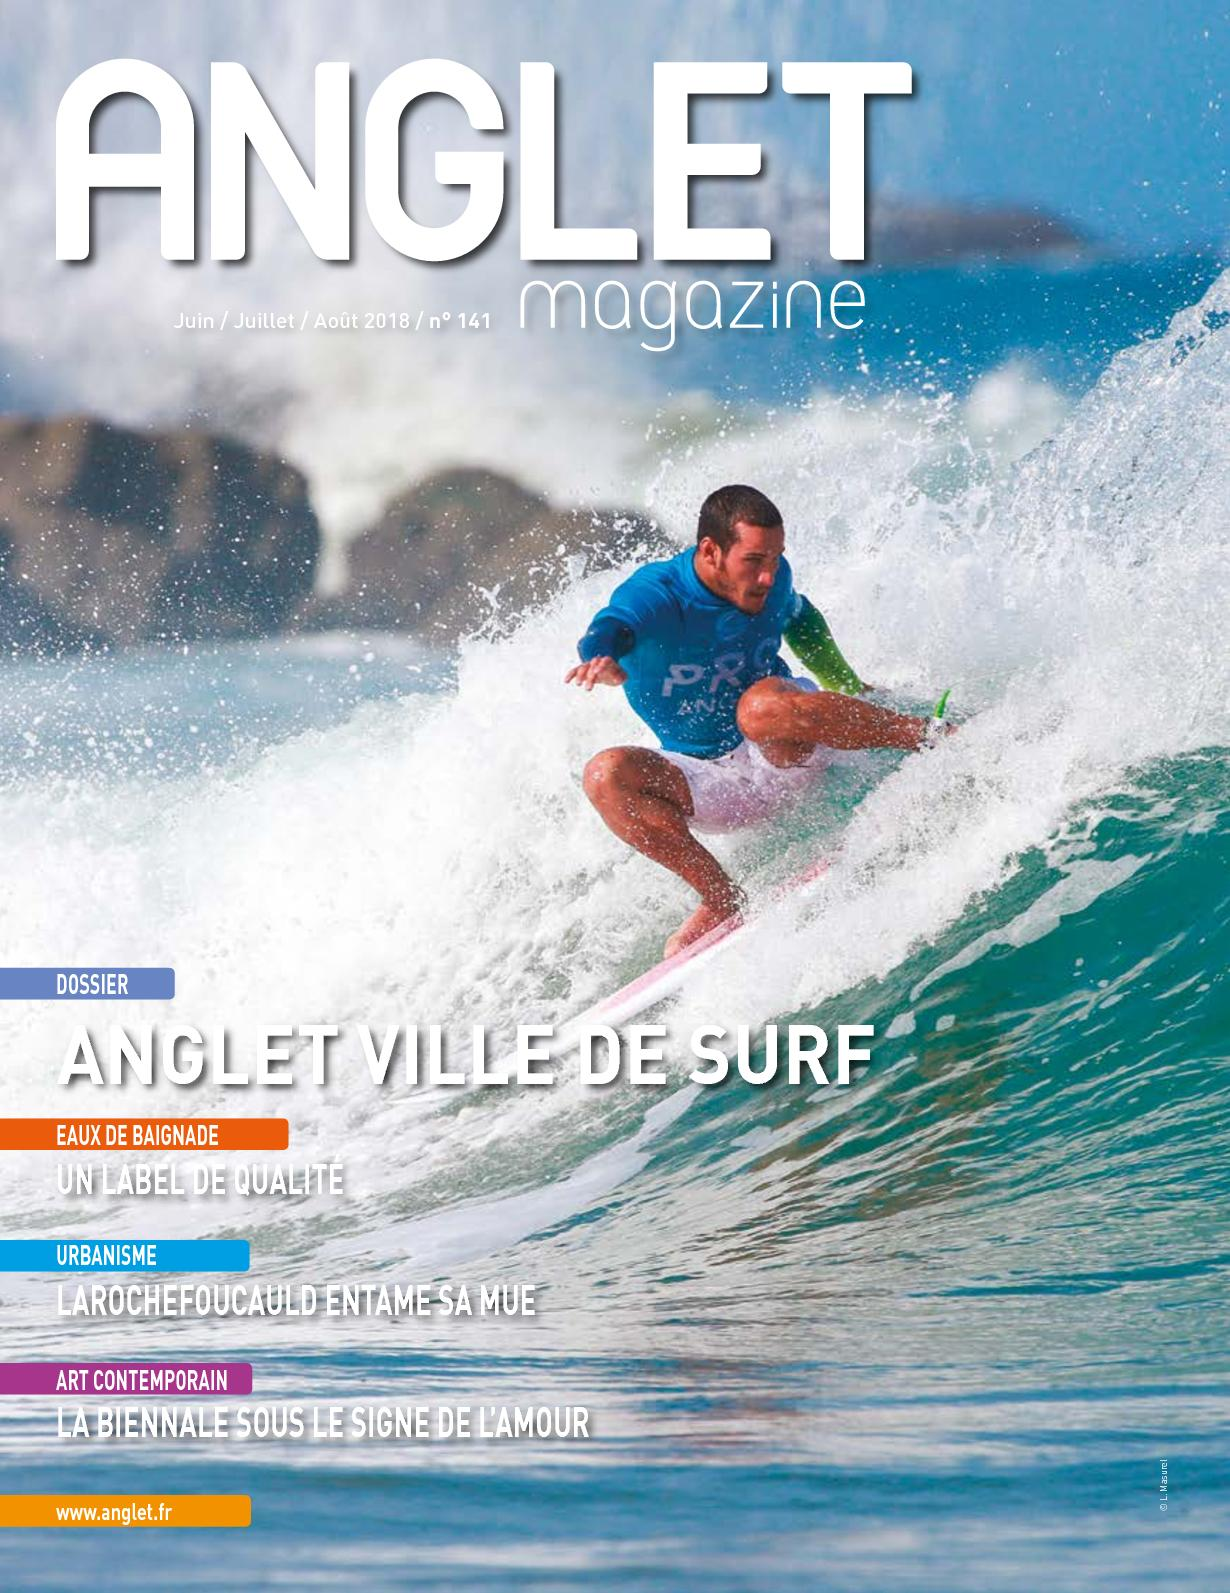 f03cf513bfff8 Calaméo - Anglet Magazine 141 - été 2018